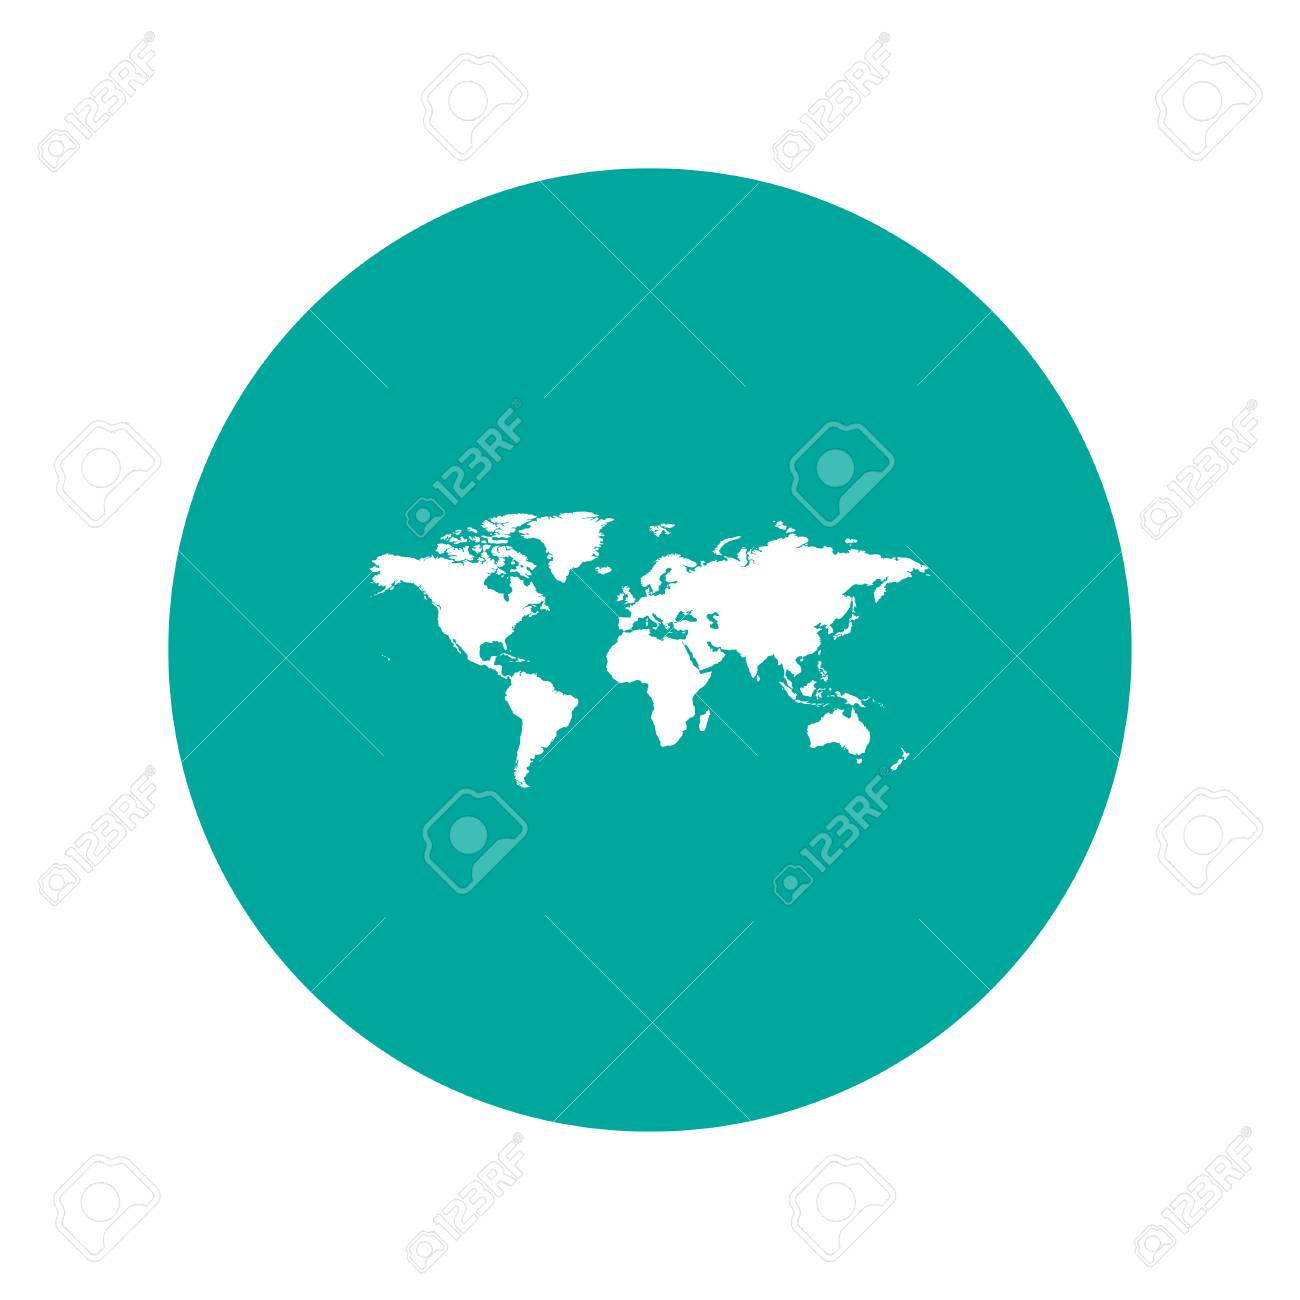 World map illustration flat design style eps 10 royalty free vector world map illustration flat design style eps 10 gumiabroncs Image collections